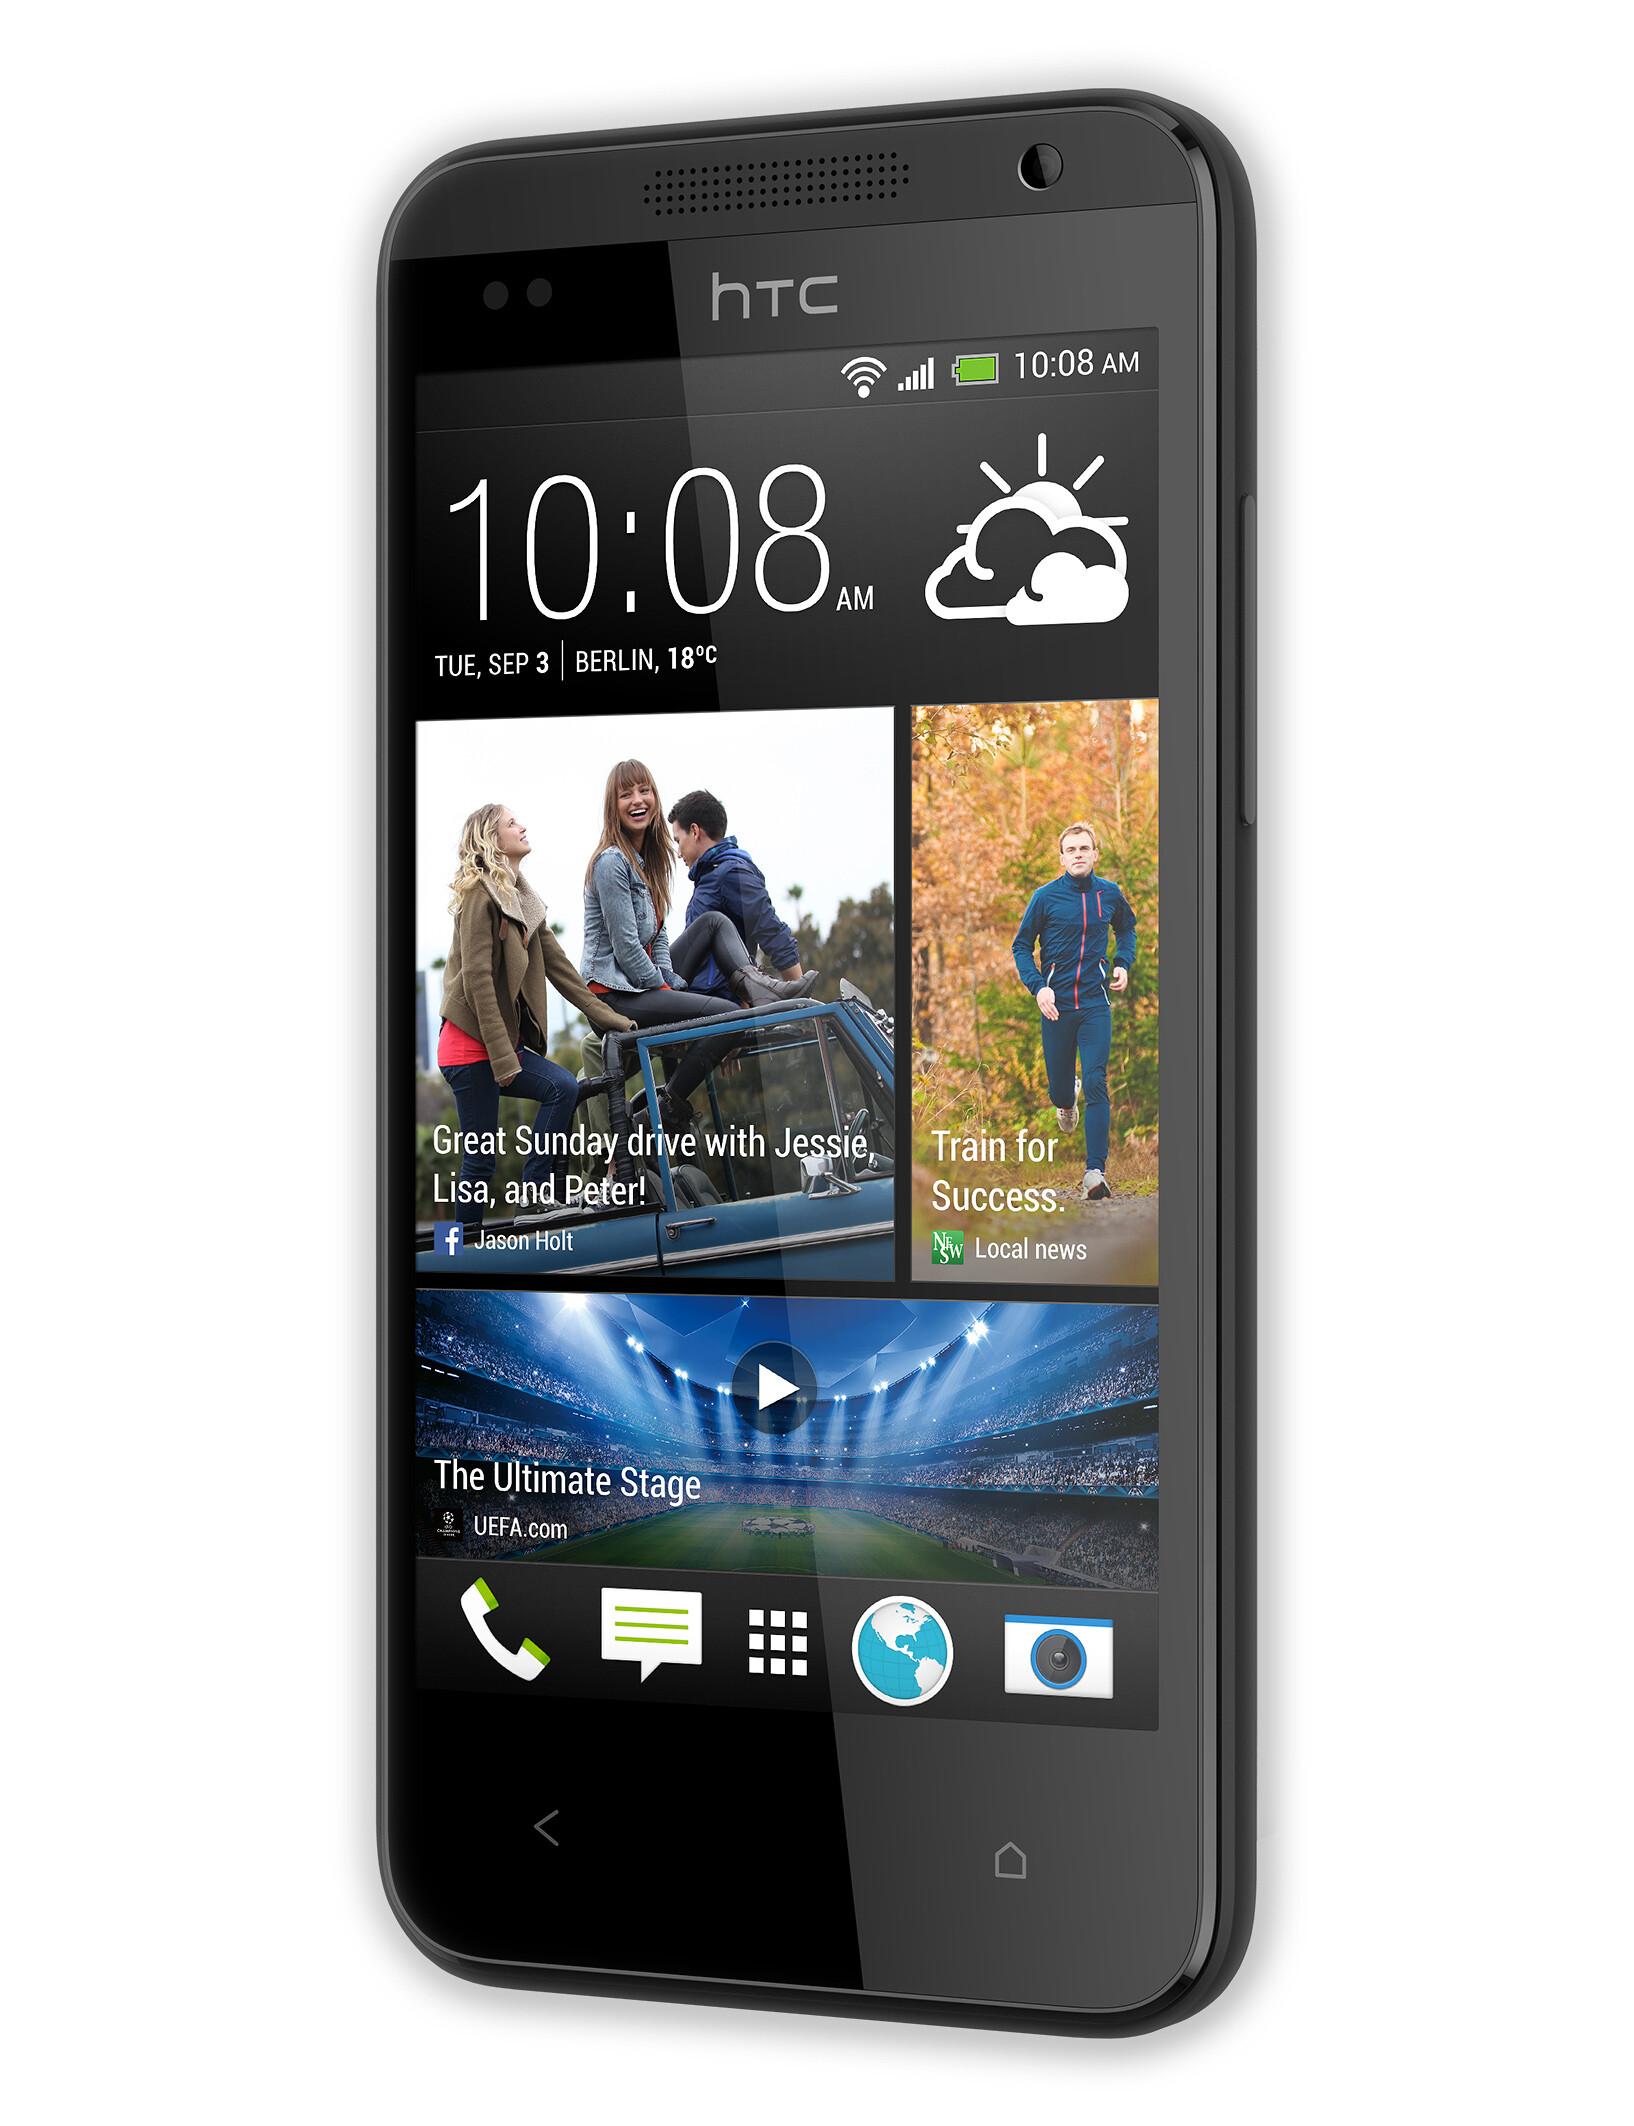 Phone Htc Desire Android Phones htc desire 300 photos 300